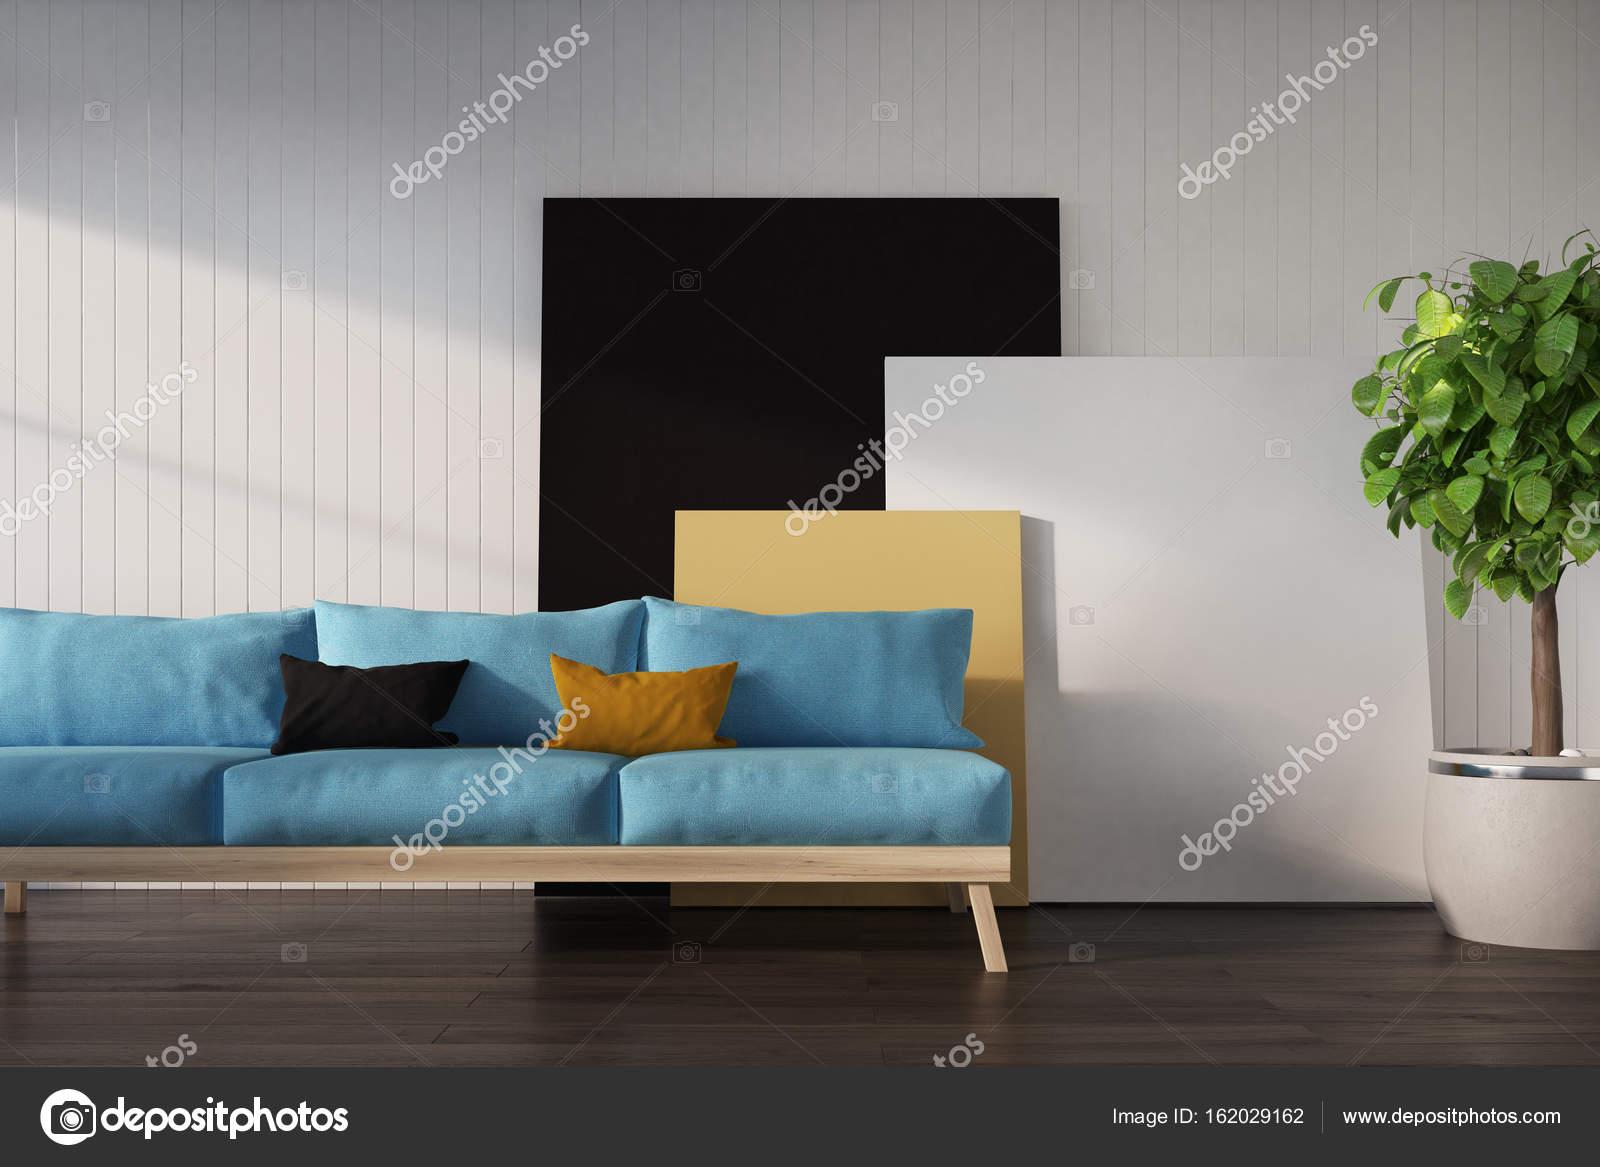 Turquoise Muur Woonkamer. Bohemian Interieur Woonstijlen En ...